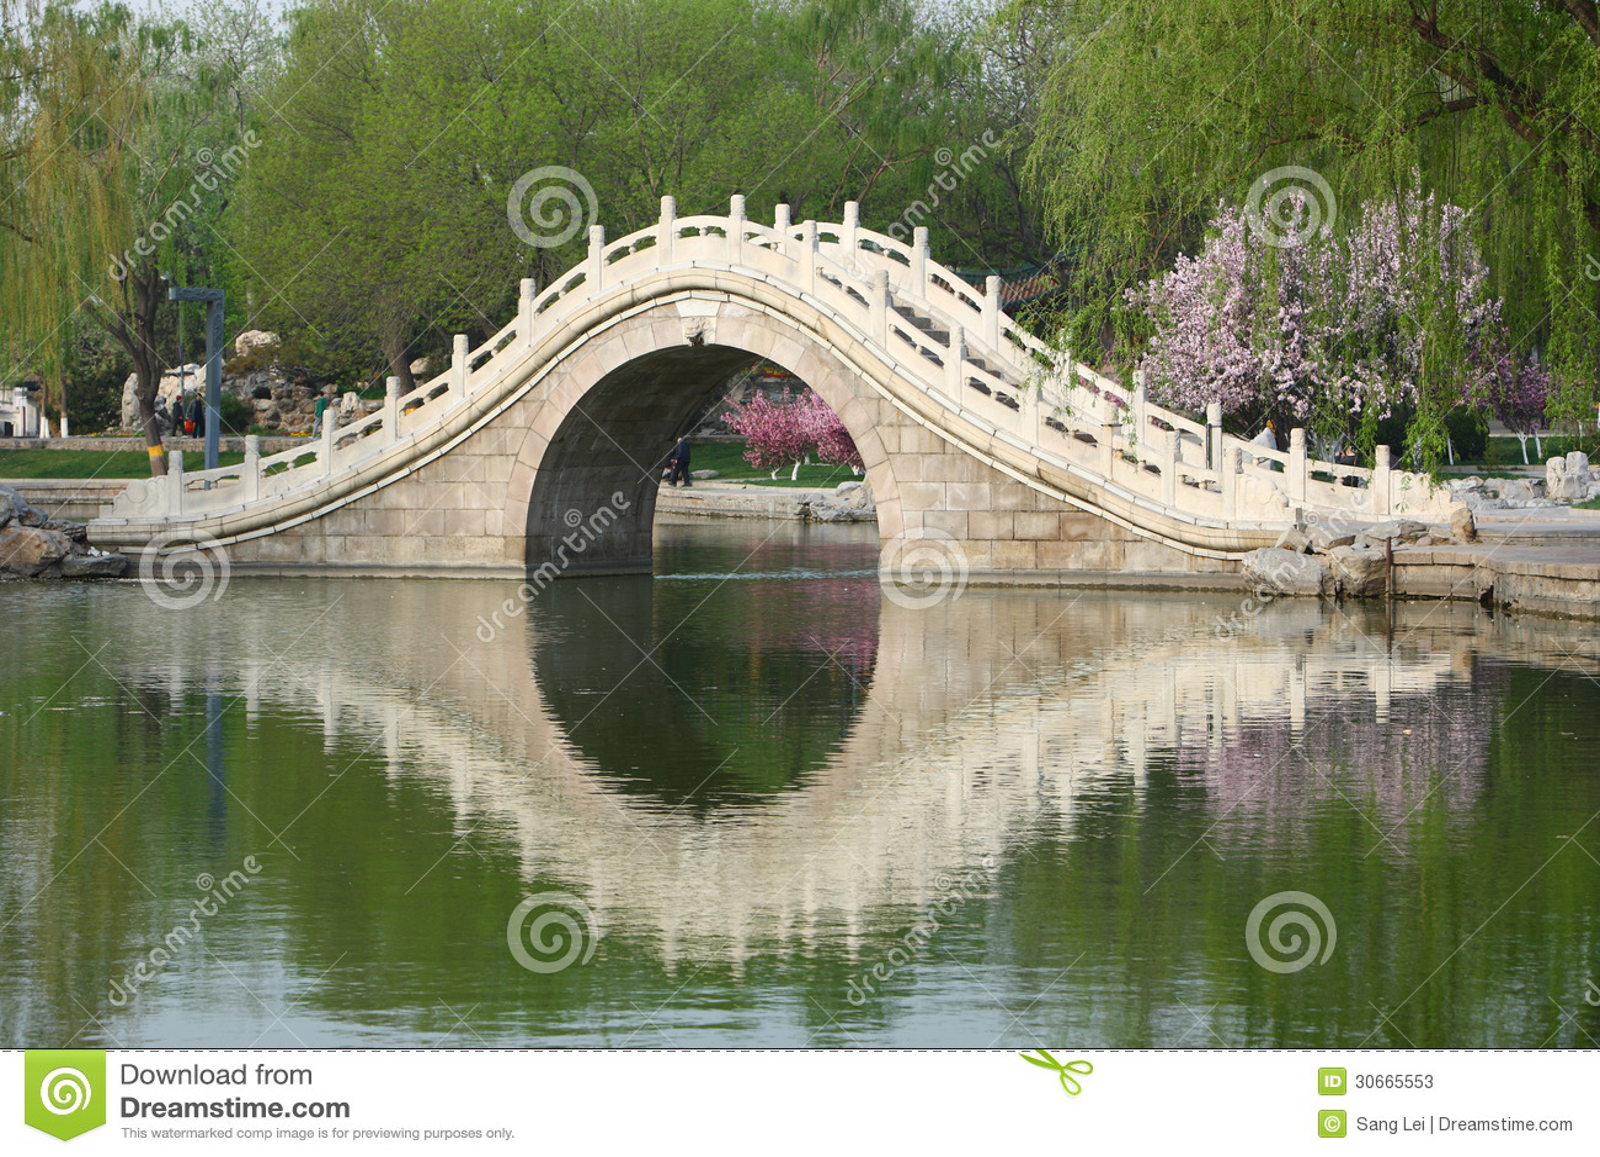 how to build a roman arch bridge